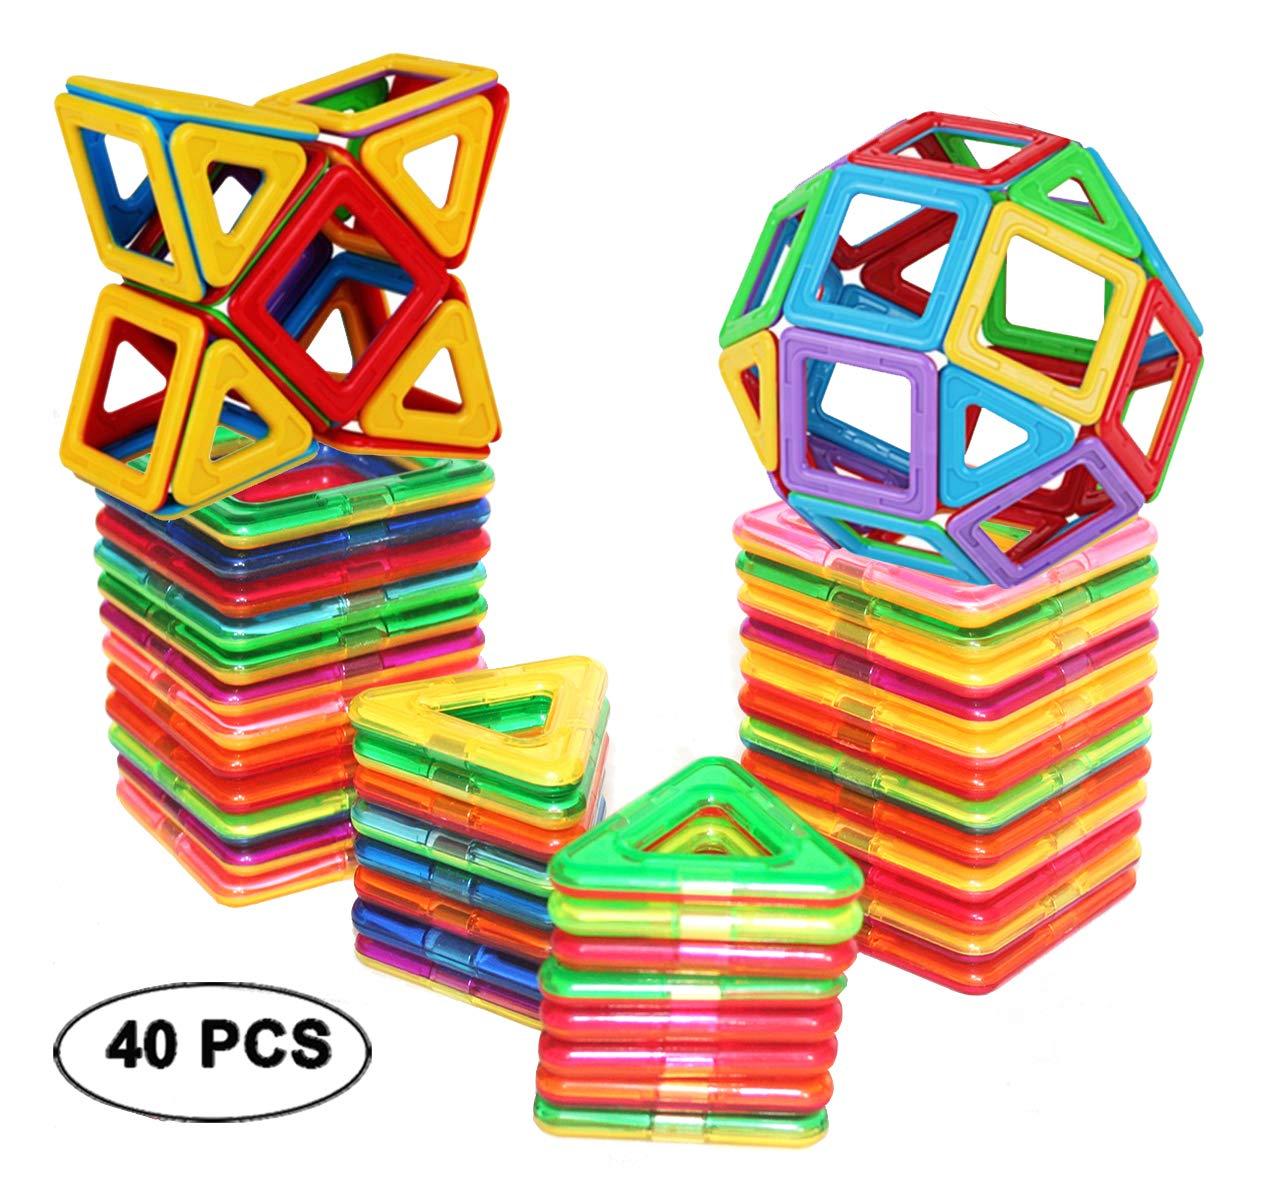 dreambuilderToy Magnetic Tiles Building Blocks Toys 40 PCS (Regular Color) by dreambuilderToy